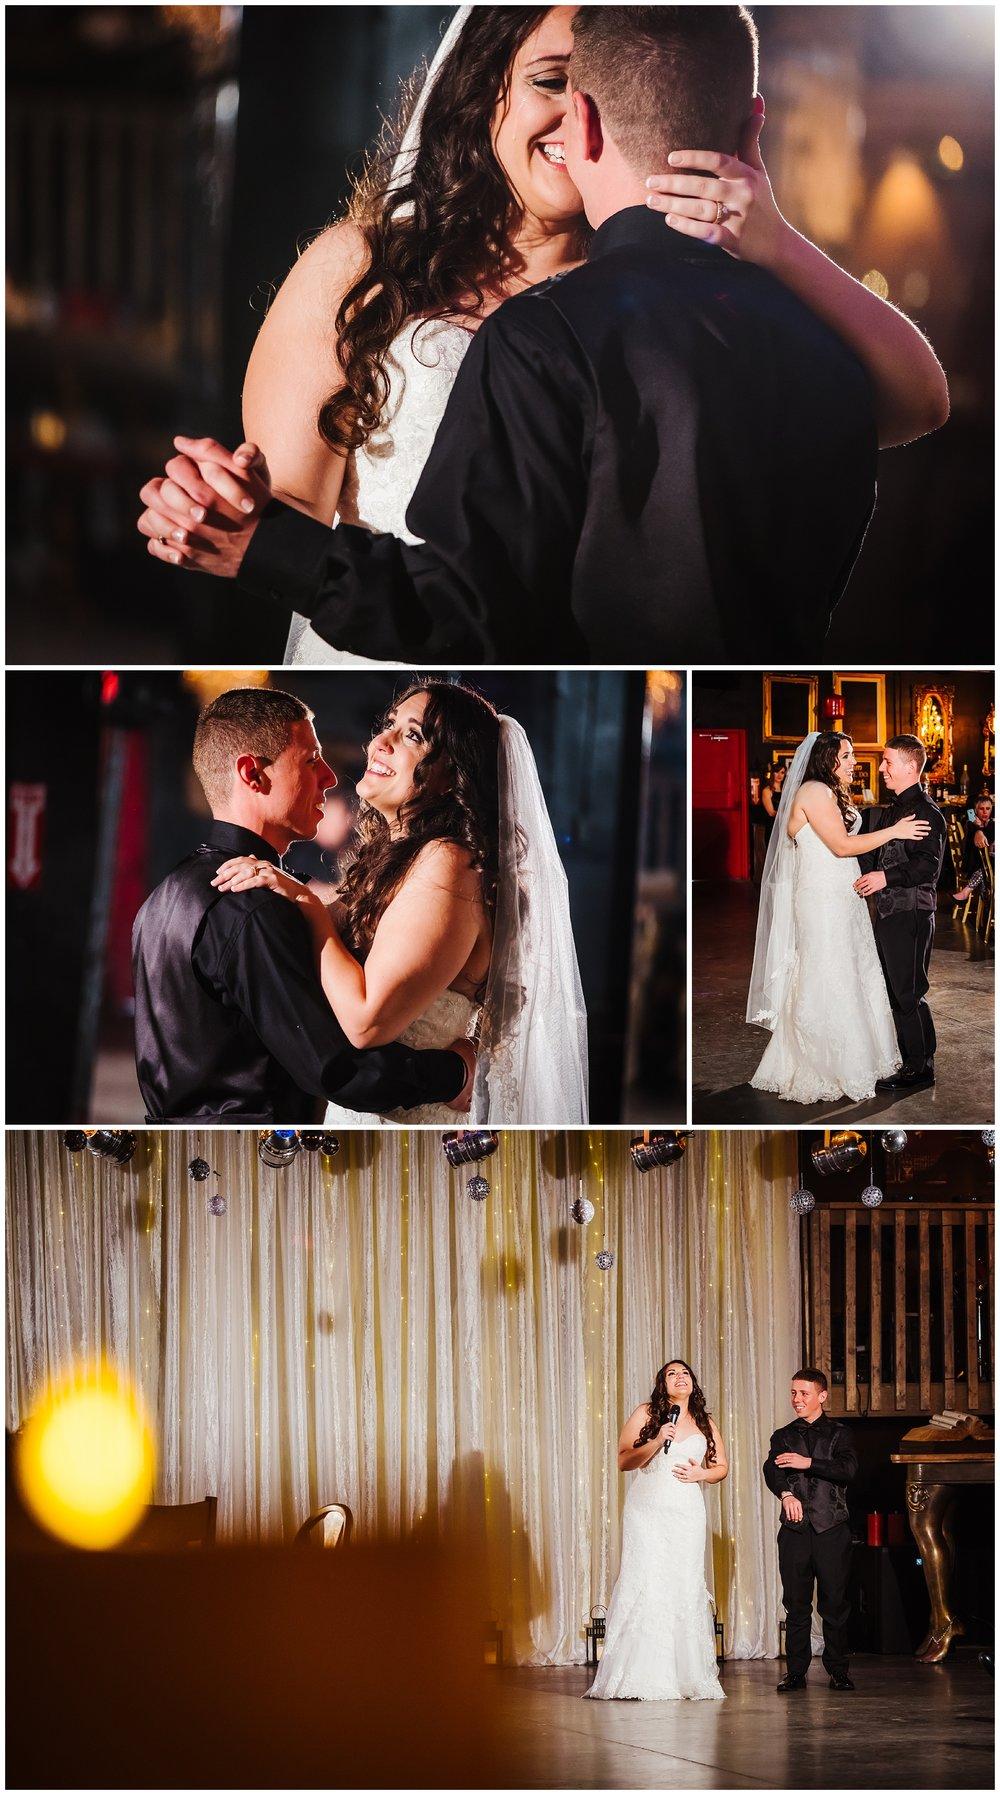 tampa-wedding-photographer-unique-indoor-venue_0047.jpg